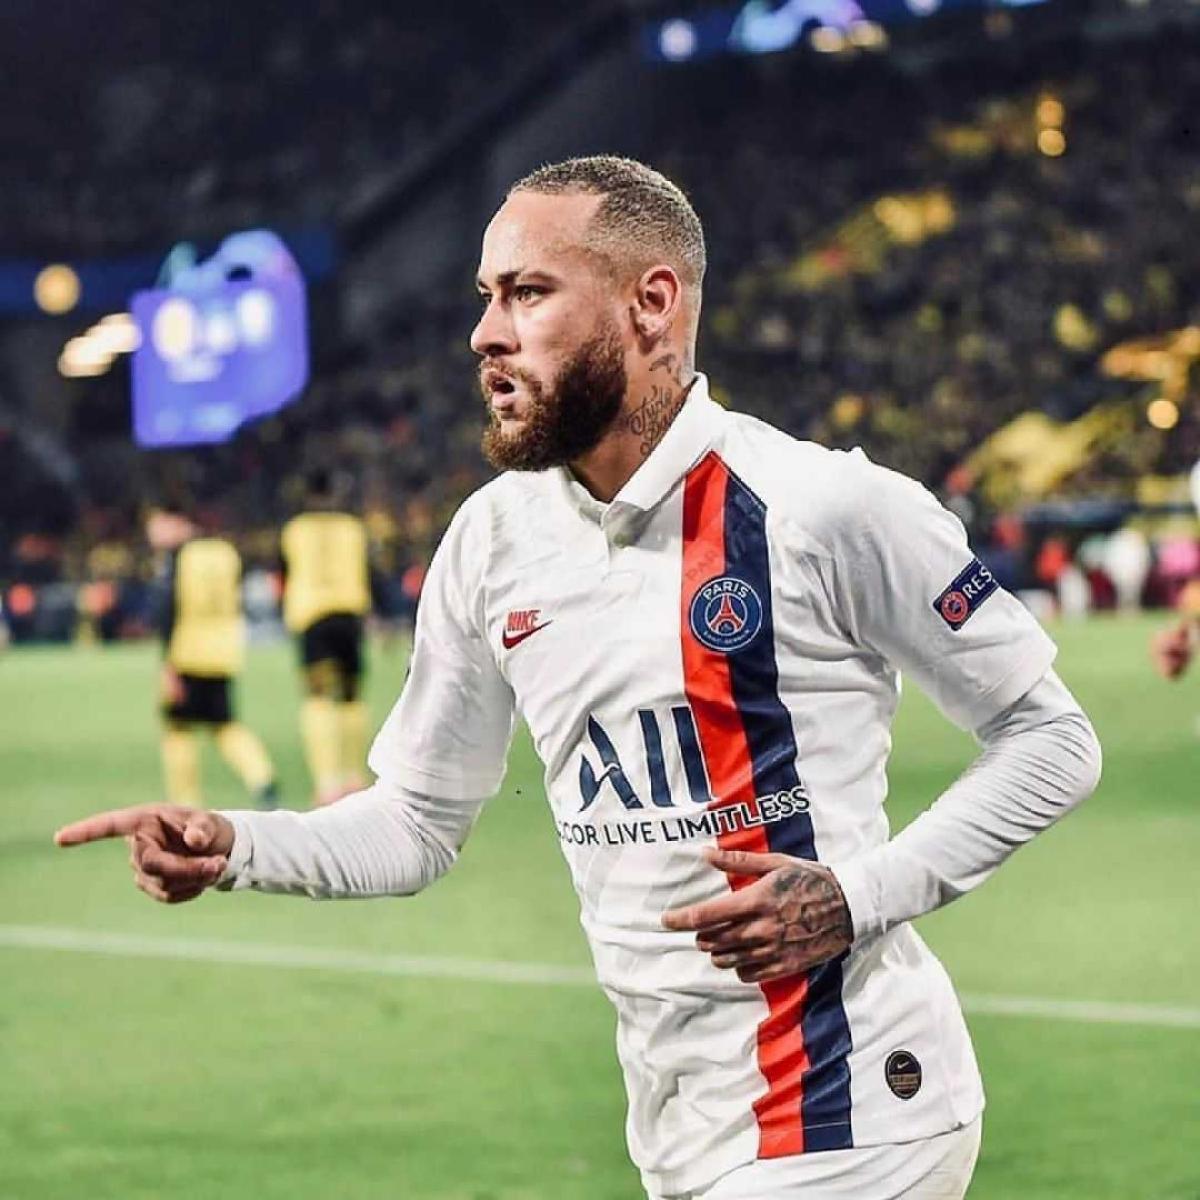 Paris Saint-Germain forward Neymar donates USD 1 million to curb coronavirus in Brazil